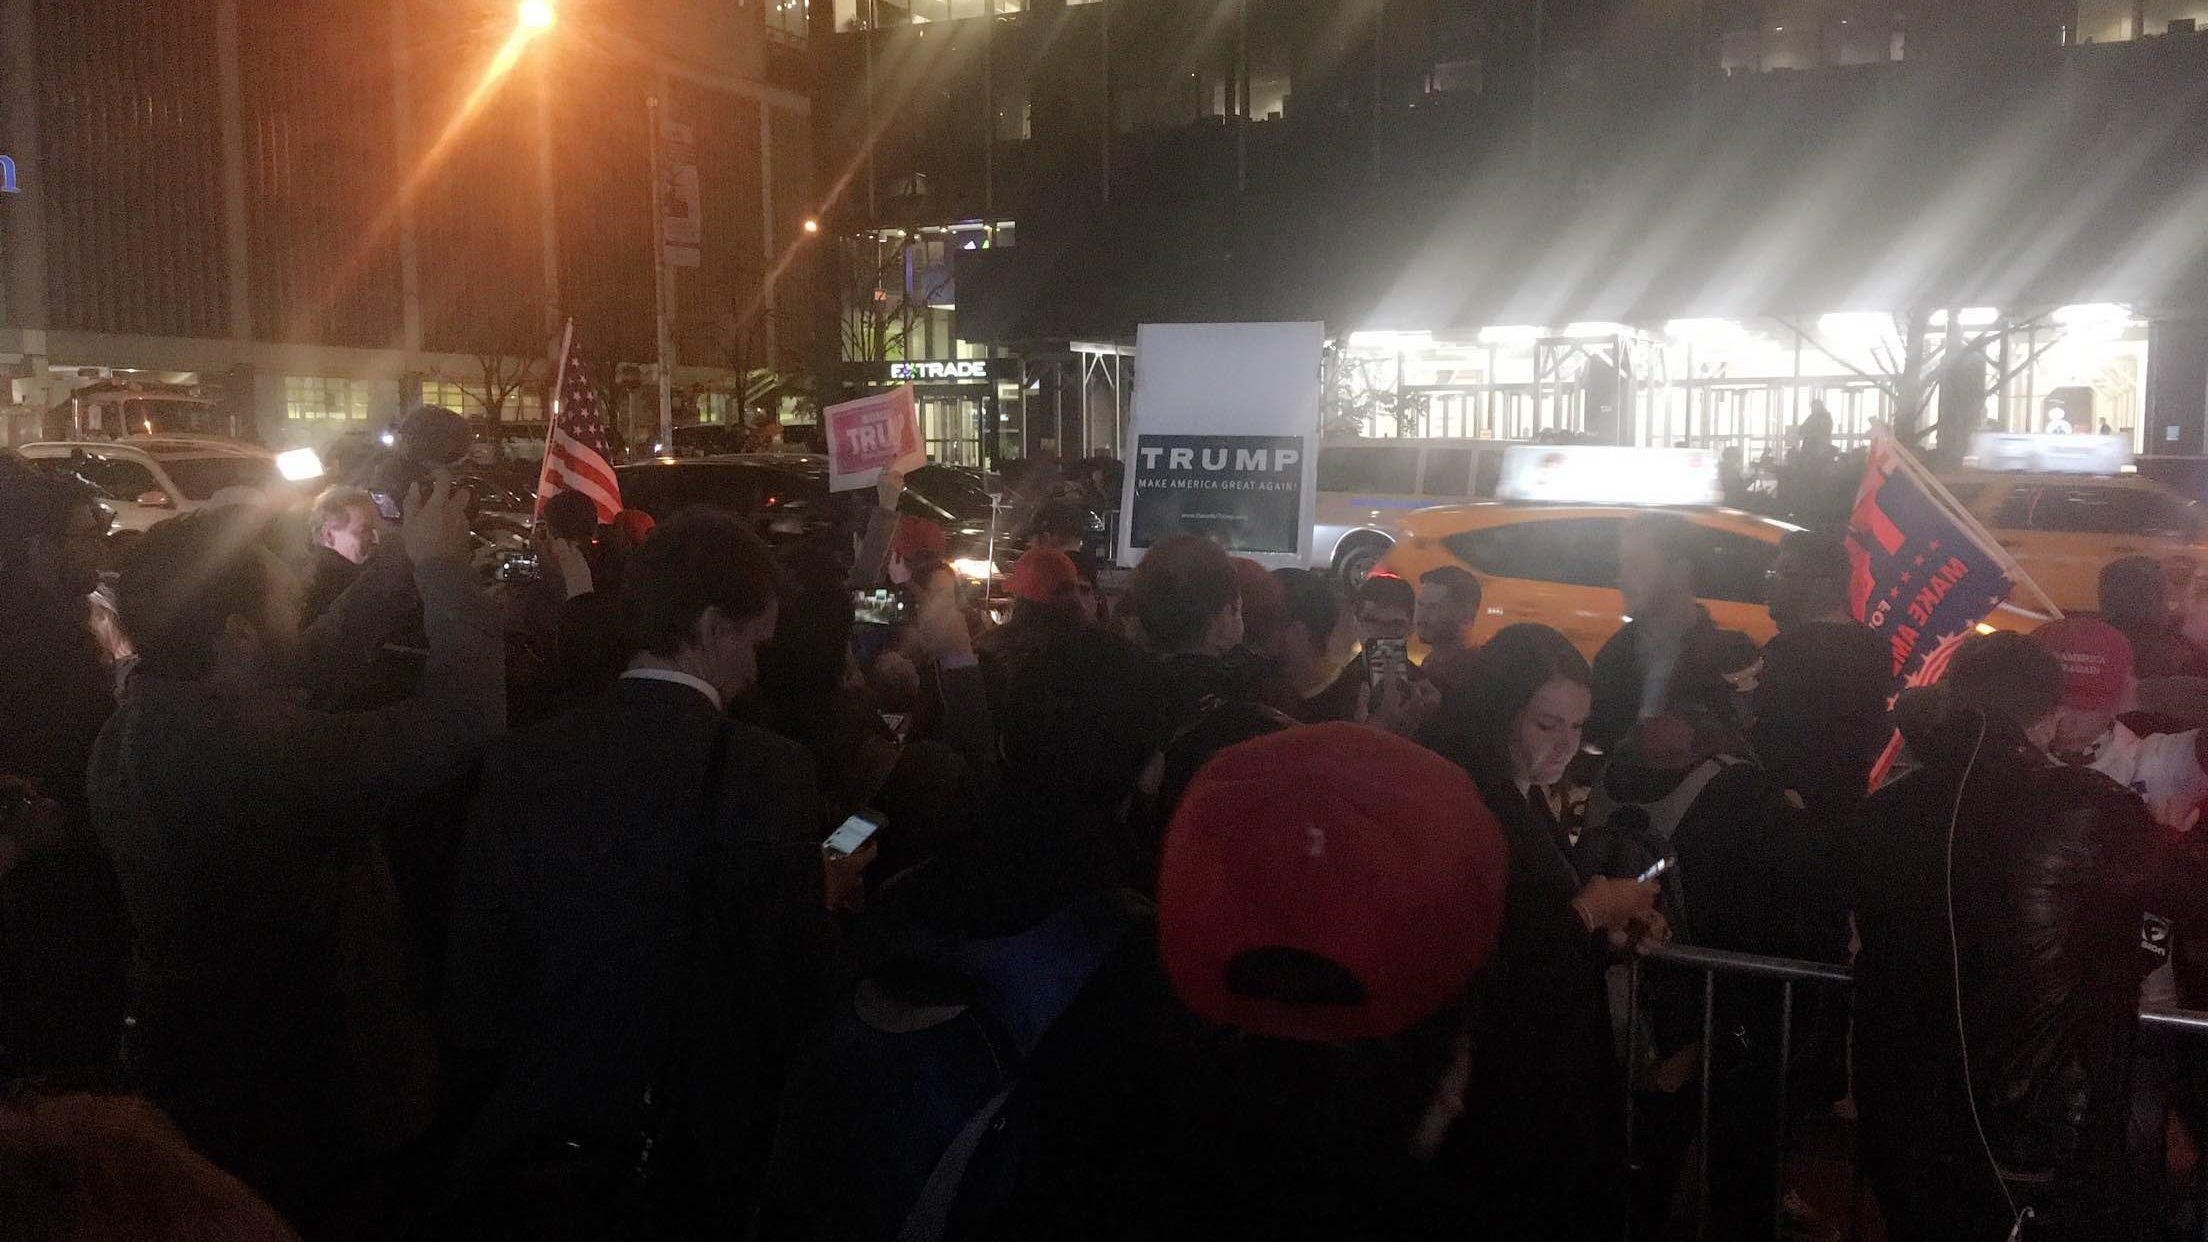 Trump supporters in New York [Sara Al-Ansari]